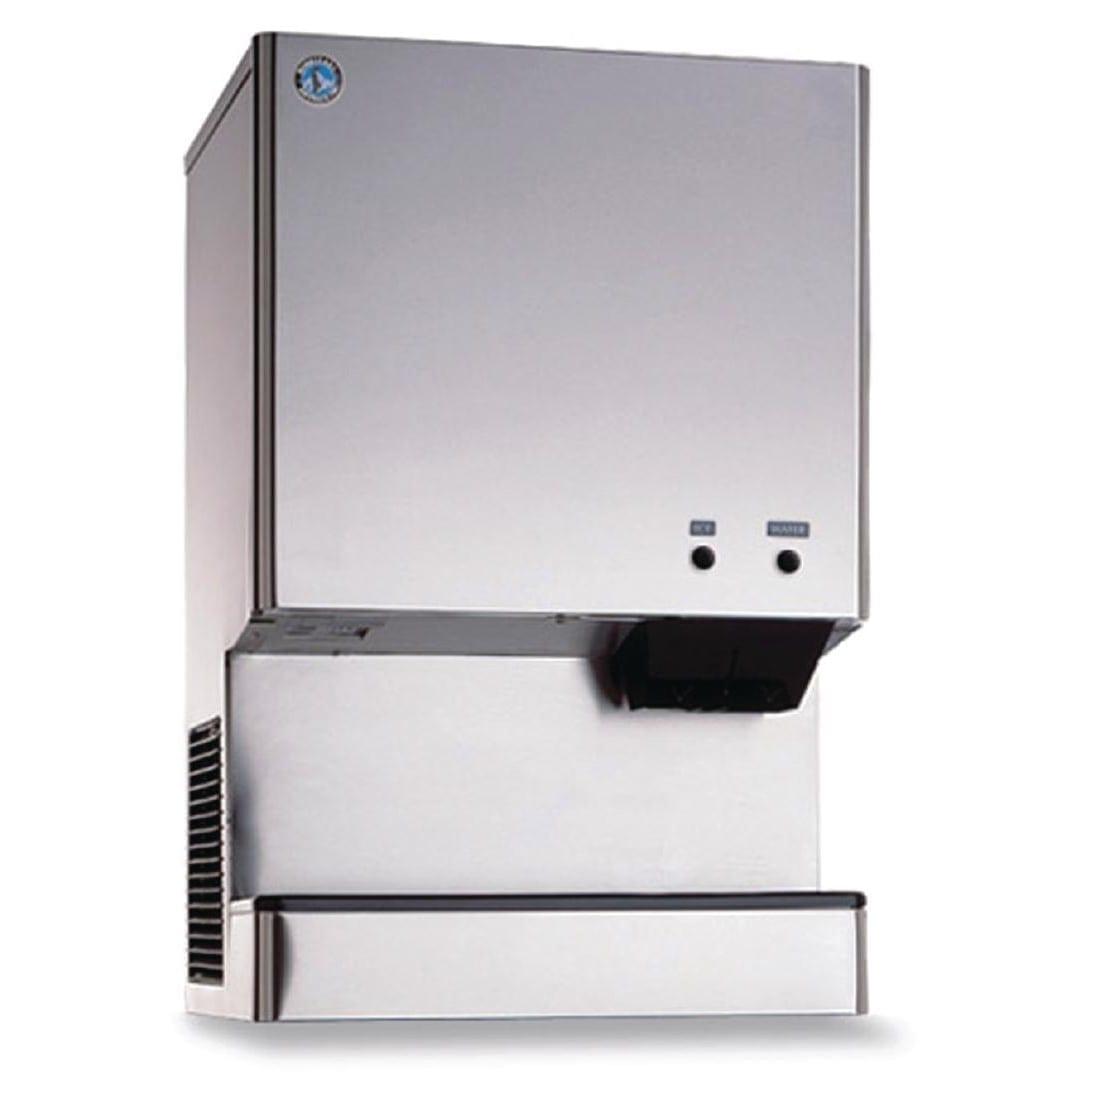 Hoshizaki Cubelet Ice & Water Dispenser 230kg/24hr (Direct)-0